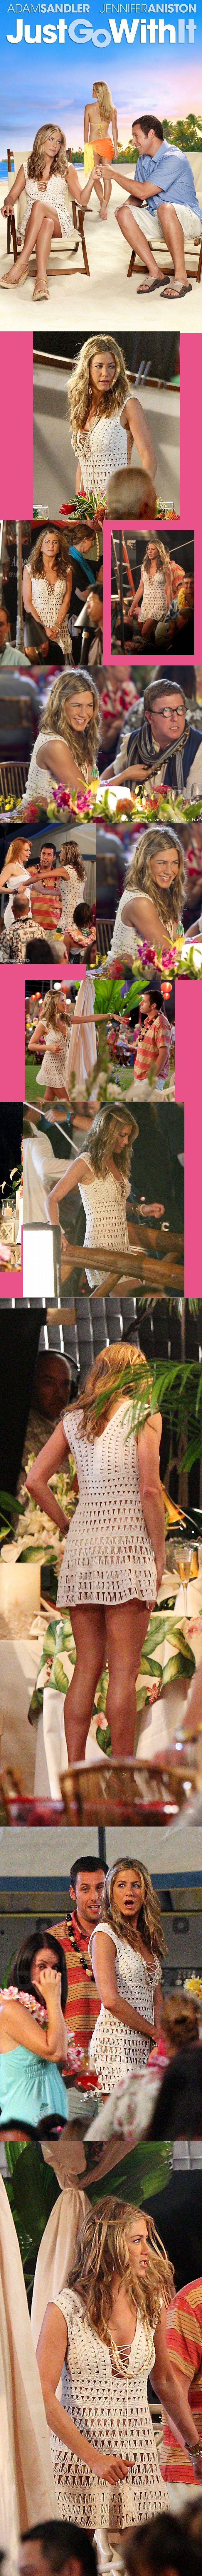 Jennifer Aniston, no filme Just Go With It, usando modelo de Anna Kosturova.